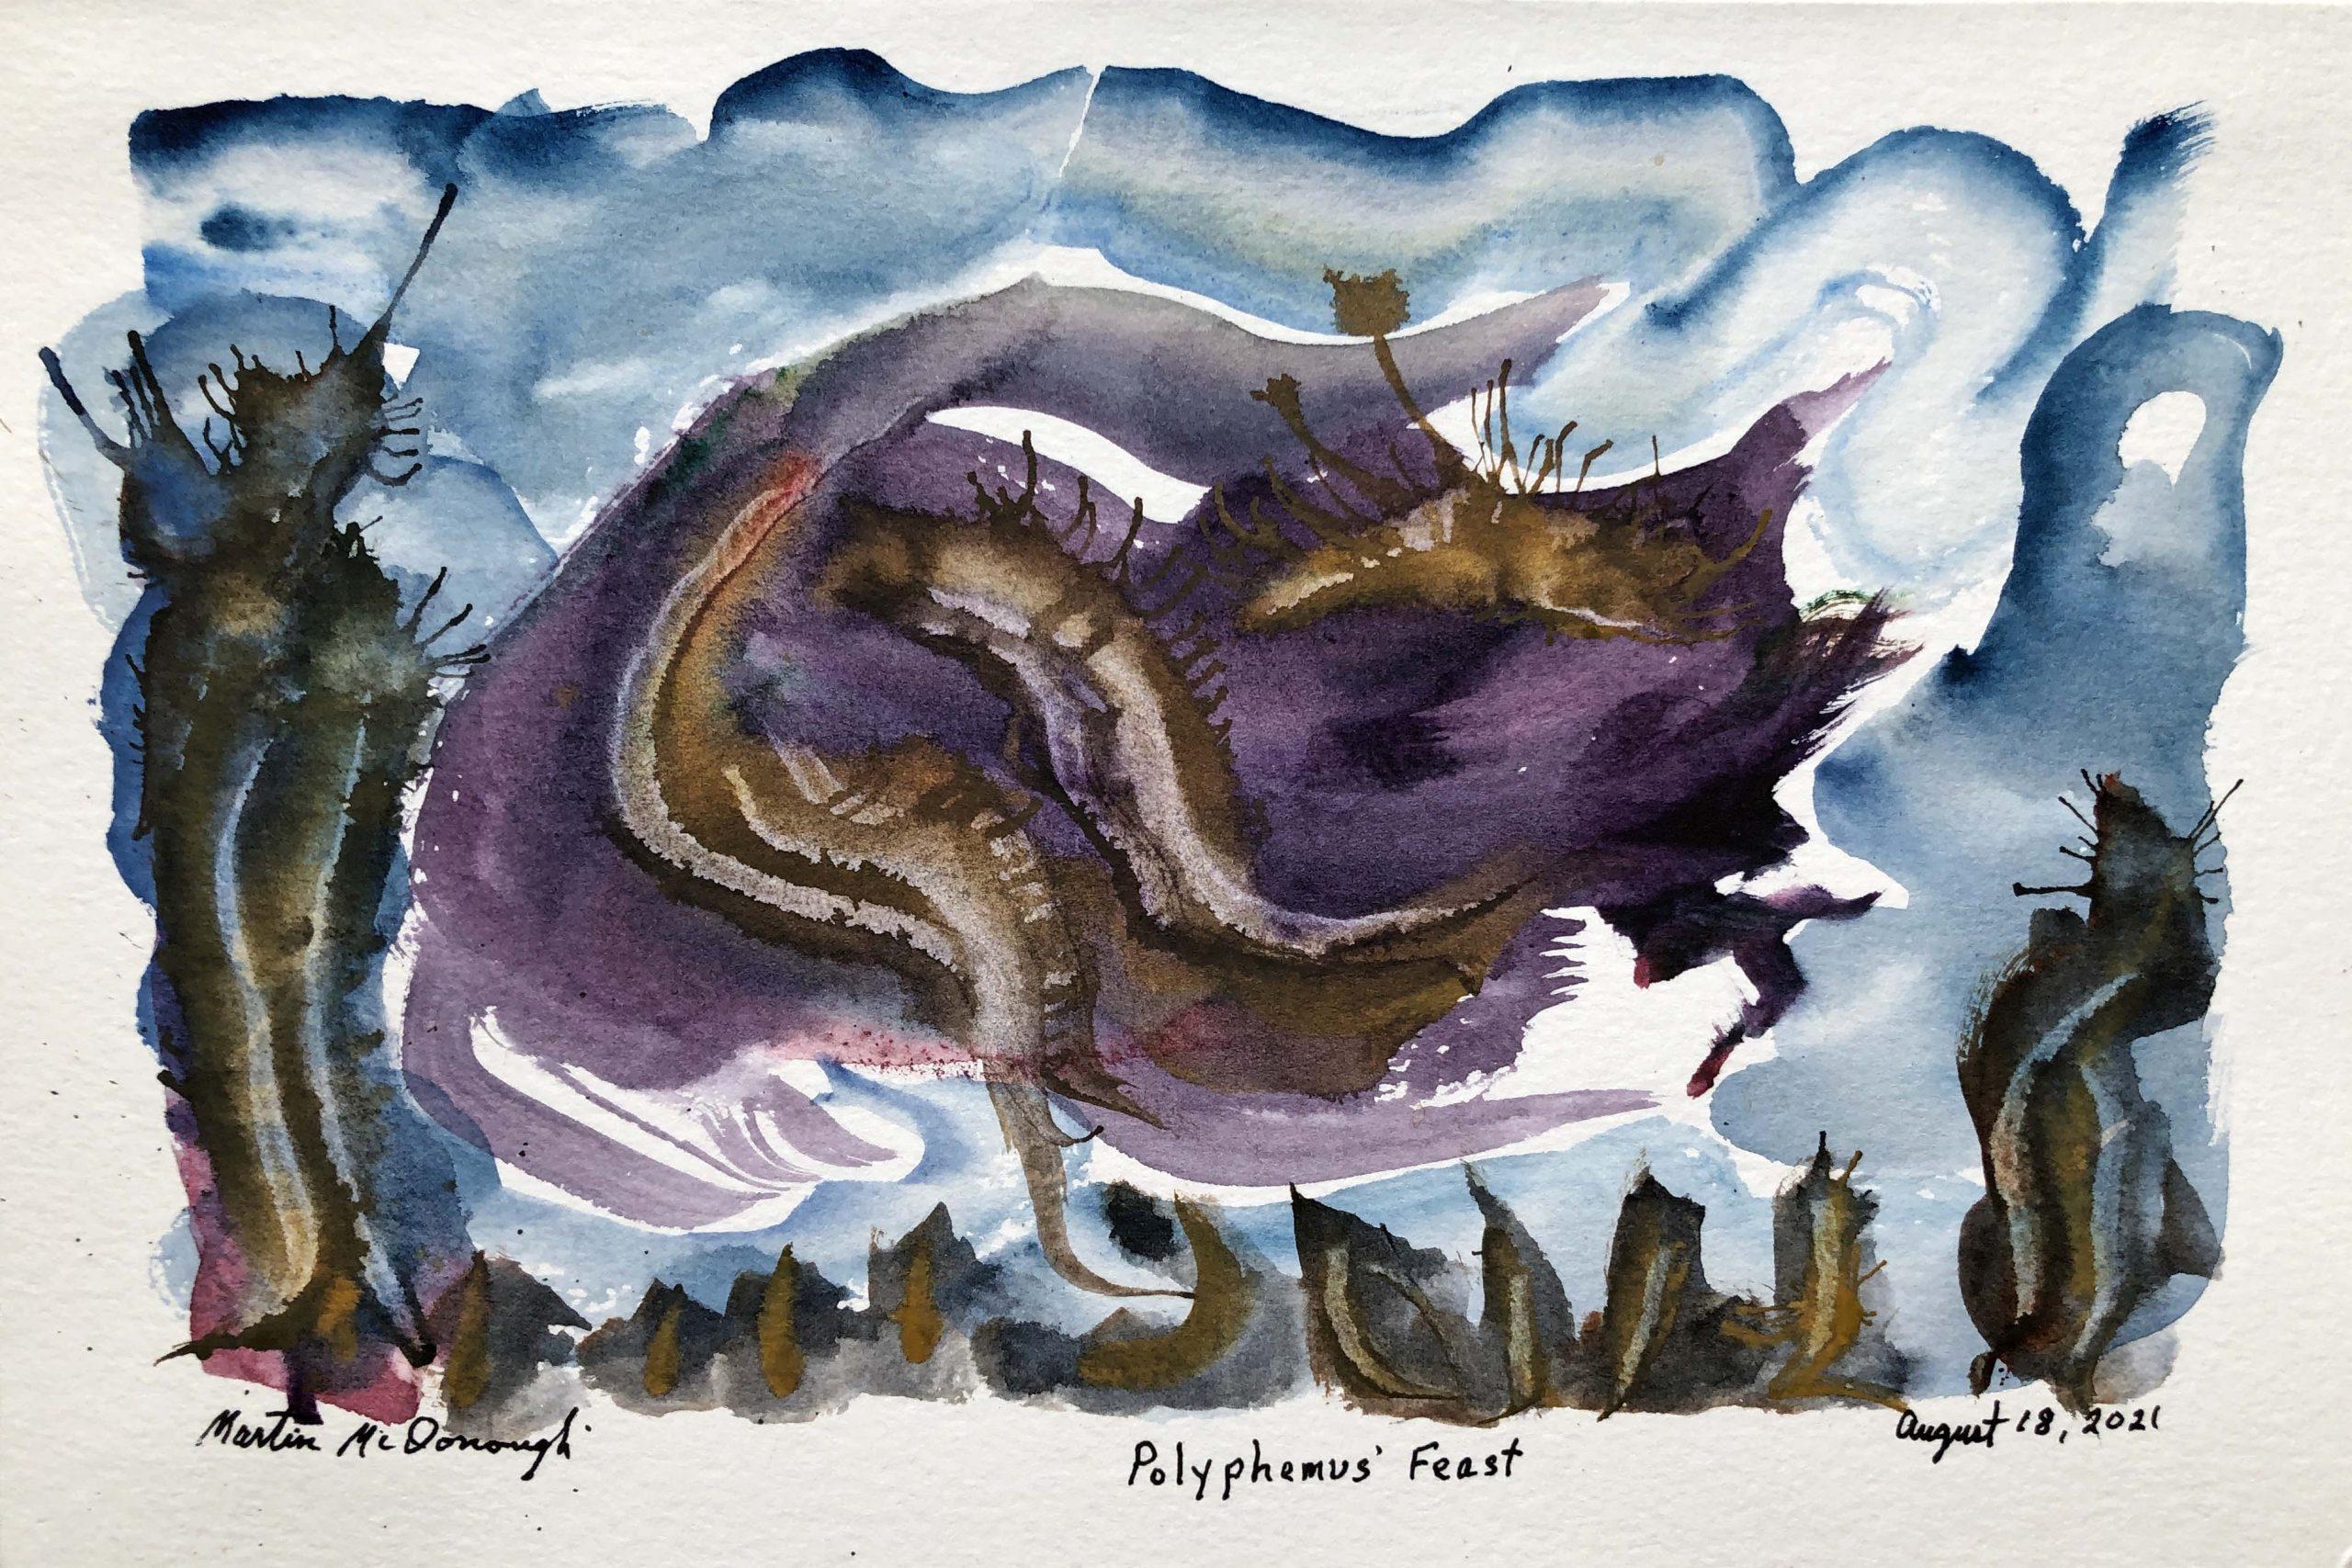 Polyphemus' Feast web